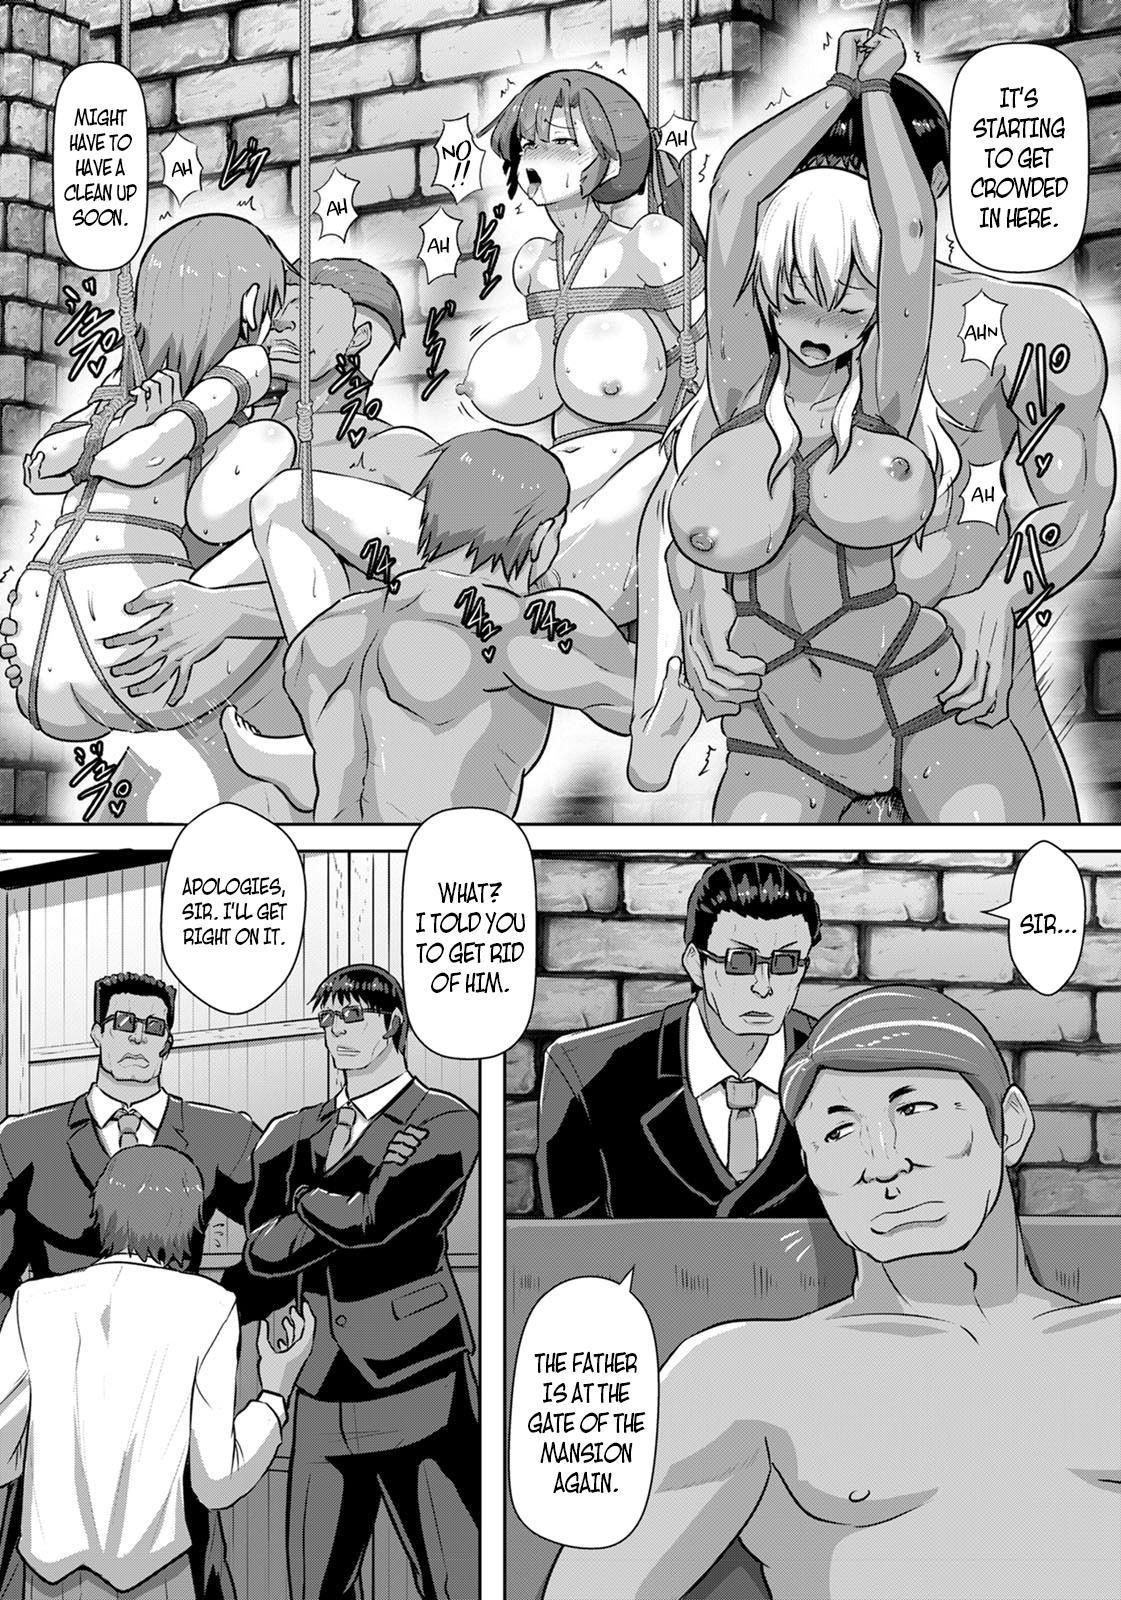 [Kumoemon] Shakkin JK Kansai Roku ~Oyako Soukan Hen~ | A Record of a High School Girl Settling Her Debts With Rape - Part 3 (ANGEL Club 2020-12) [English] [CBS] [Digital] 3